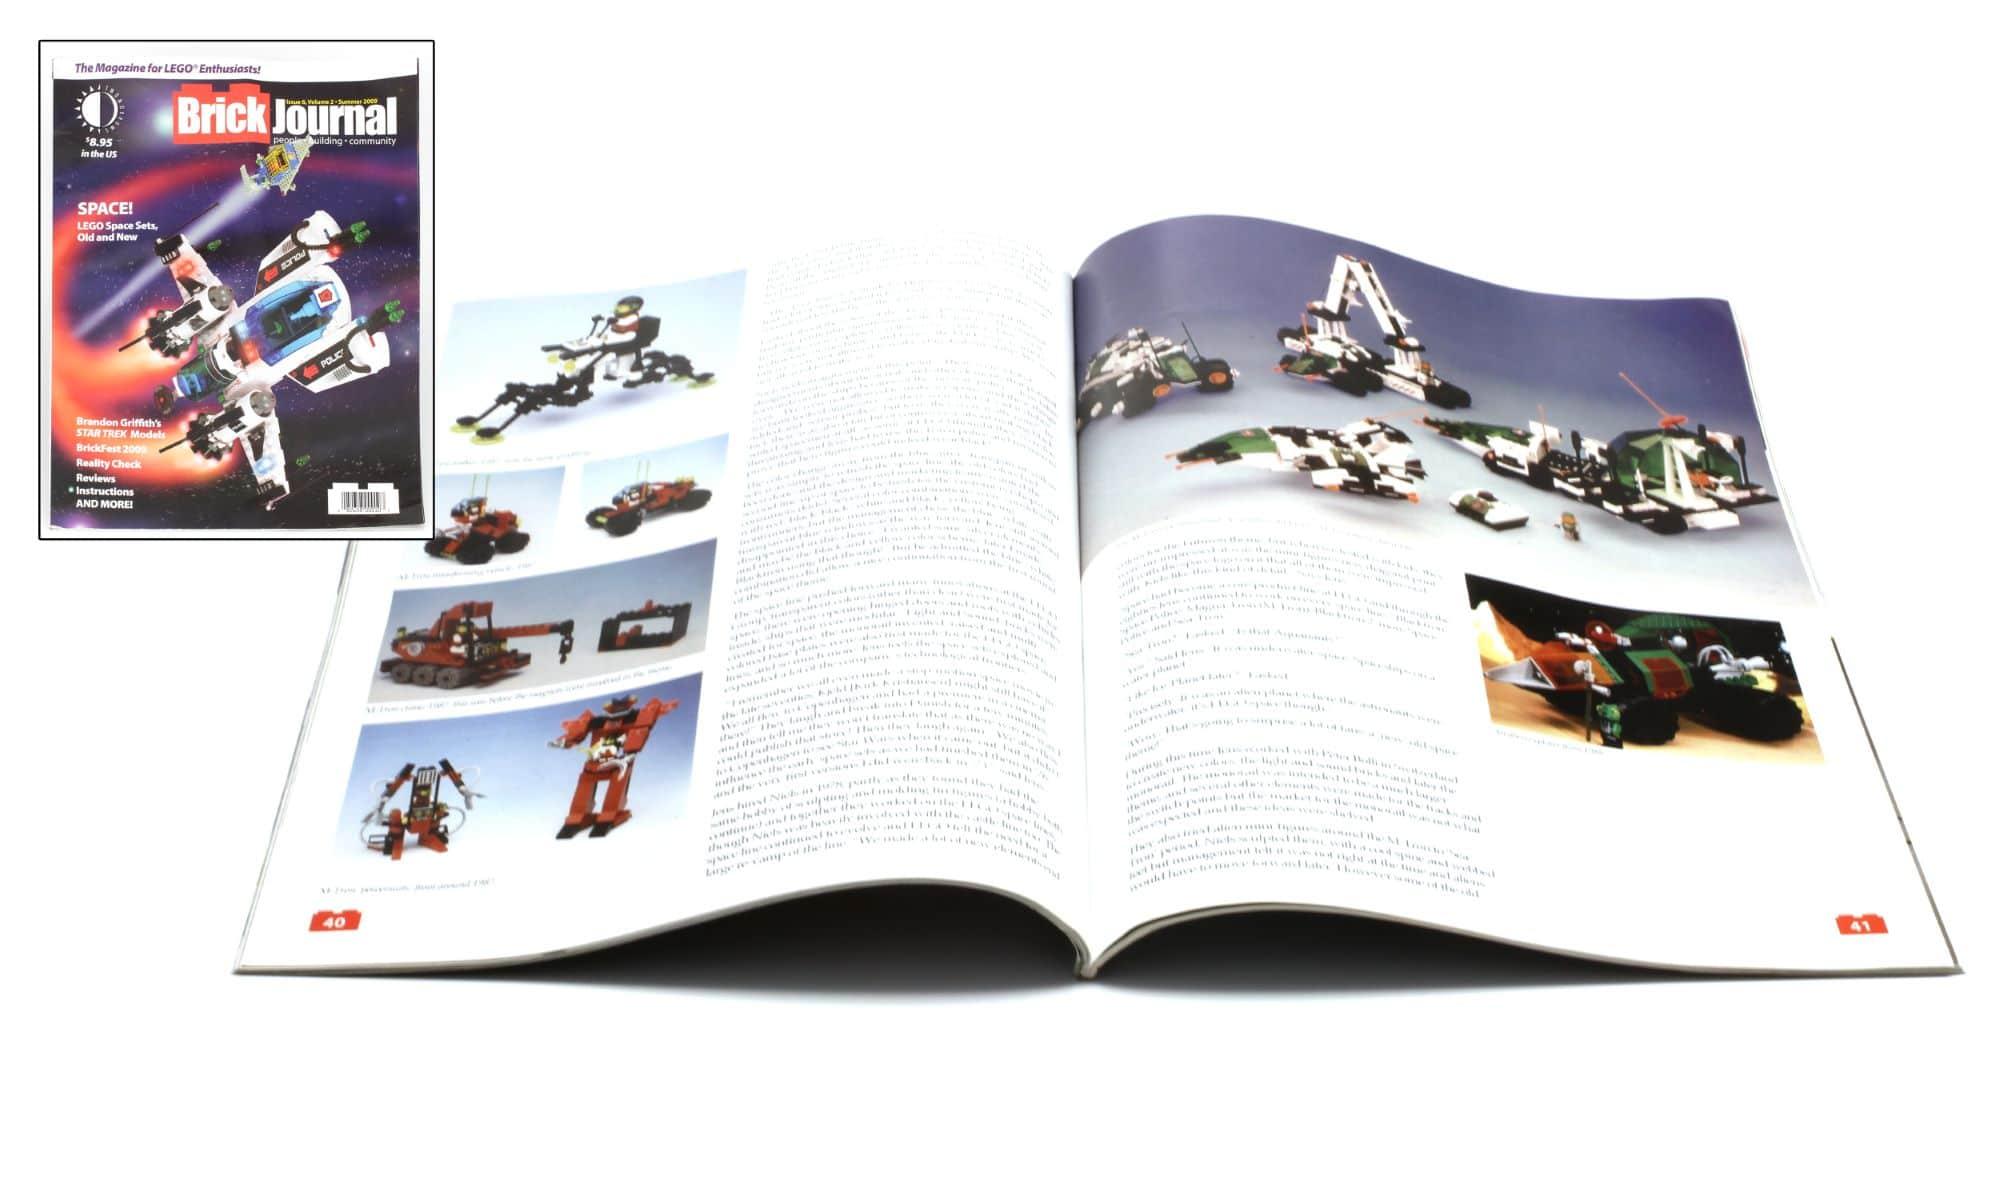 LEGO M Tron Prototypen Brick Journal